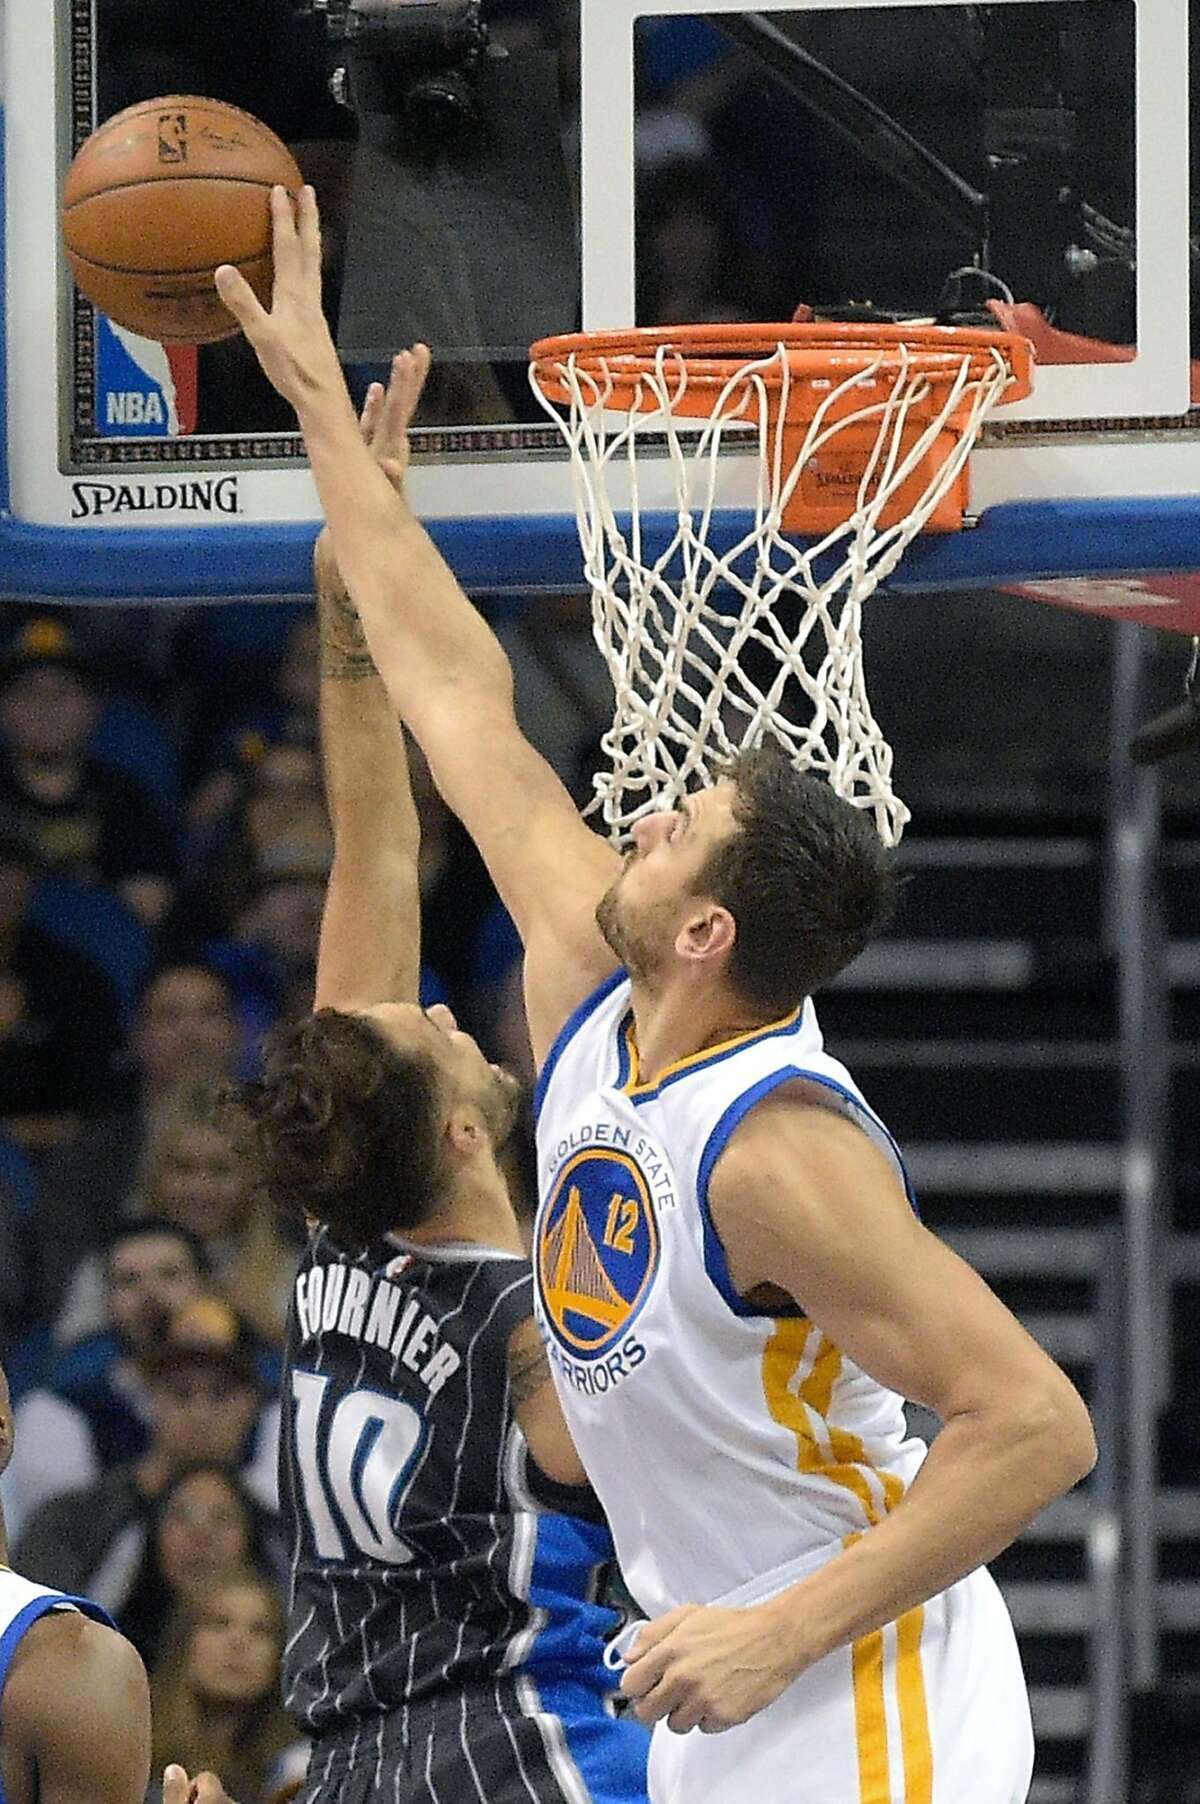 Warriors center Andrew Bogut (12) blocks a shot by Magic guard Evan Fournier (10) during Thursday's game in Orlando.